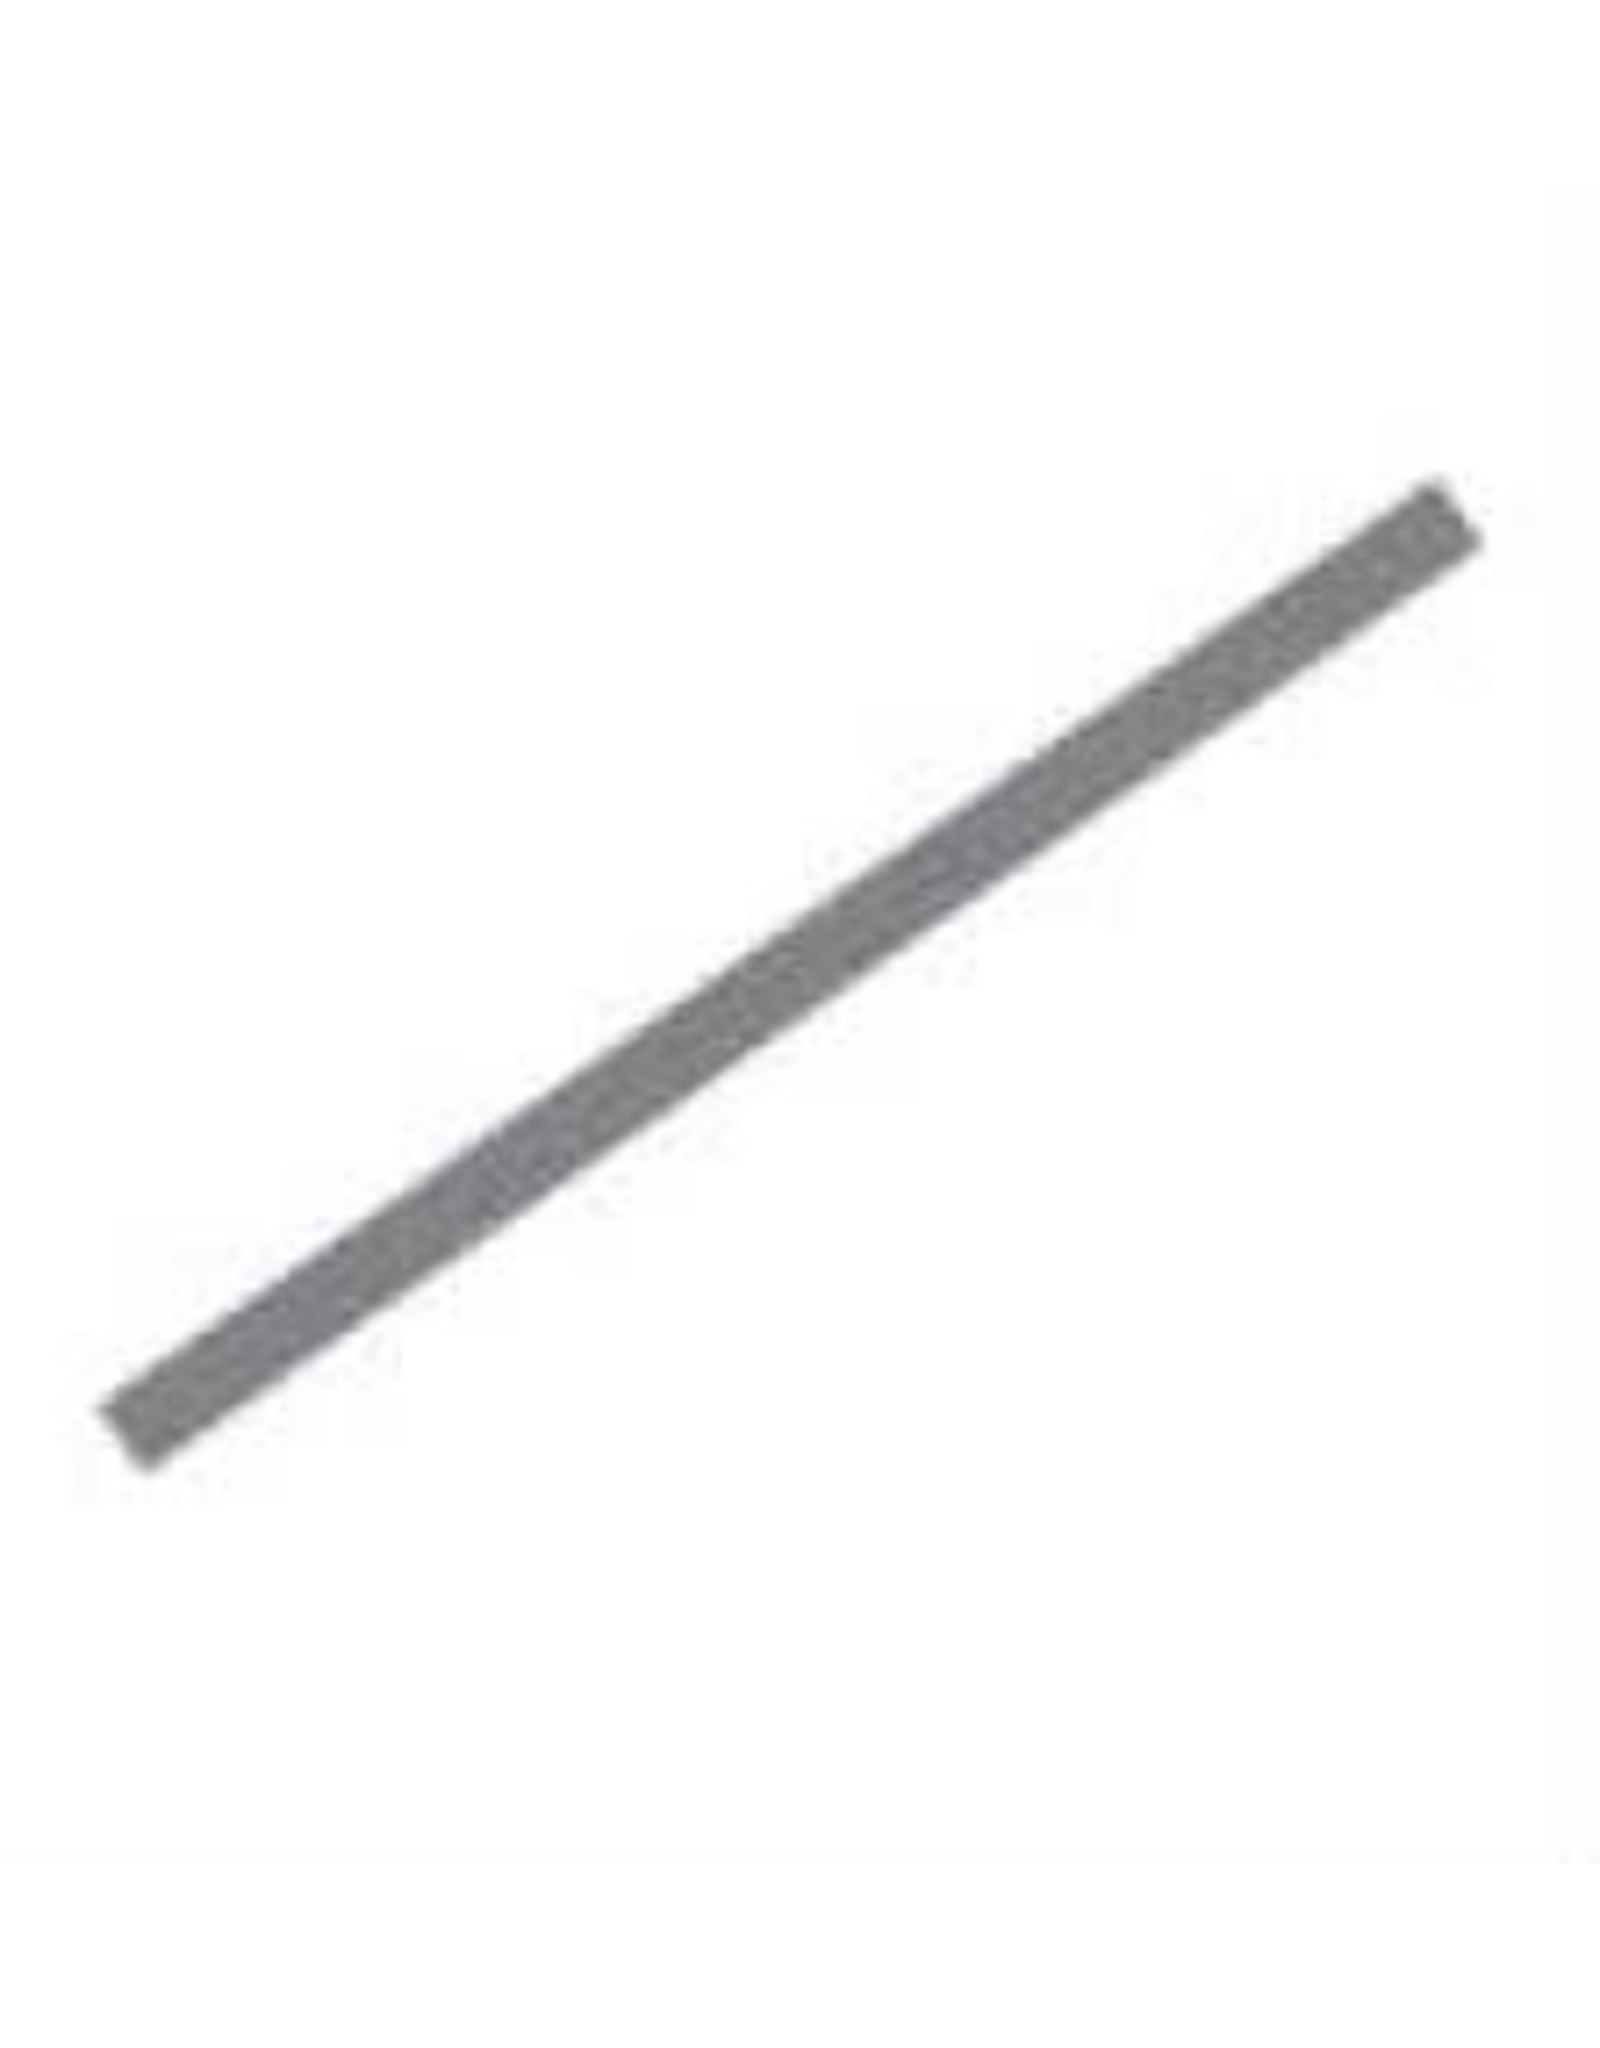 TM4 Cable protector (5 units/bag)